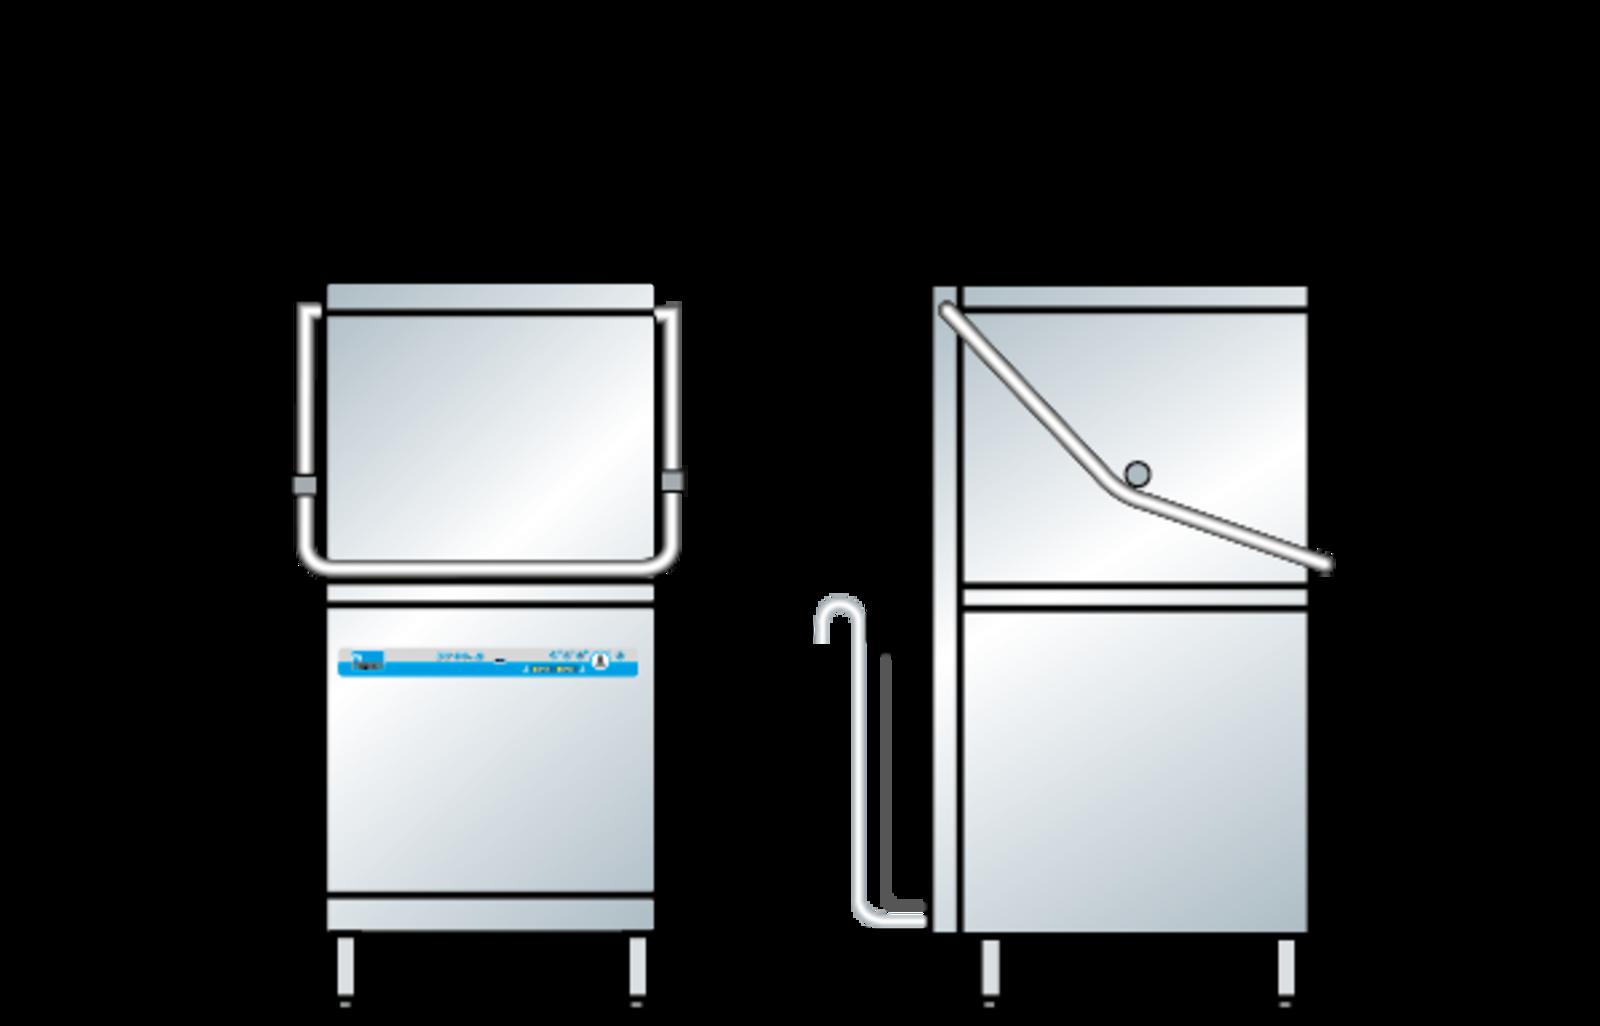 Premium-quality pass through dishwasher - MEIKO UK